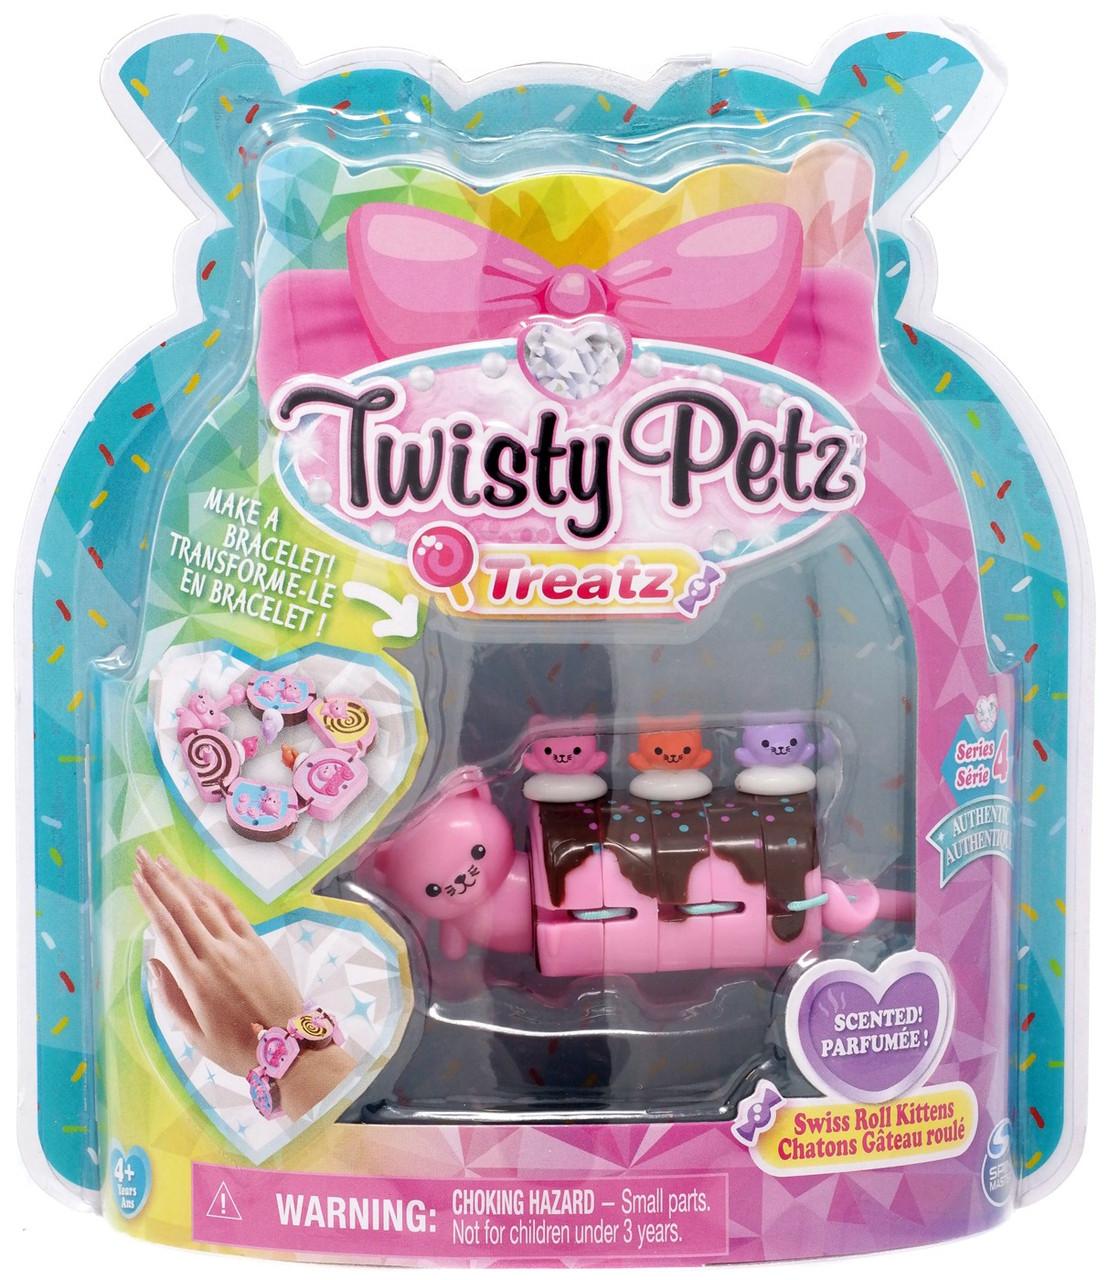 Twisty Petz Velvette Flying Unicorn Bracelet